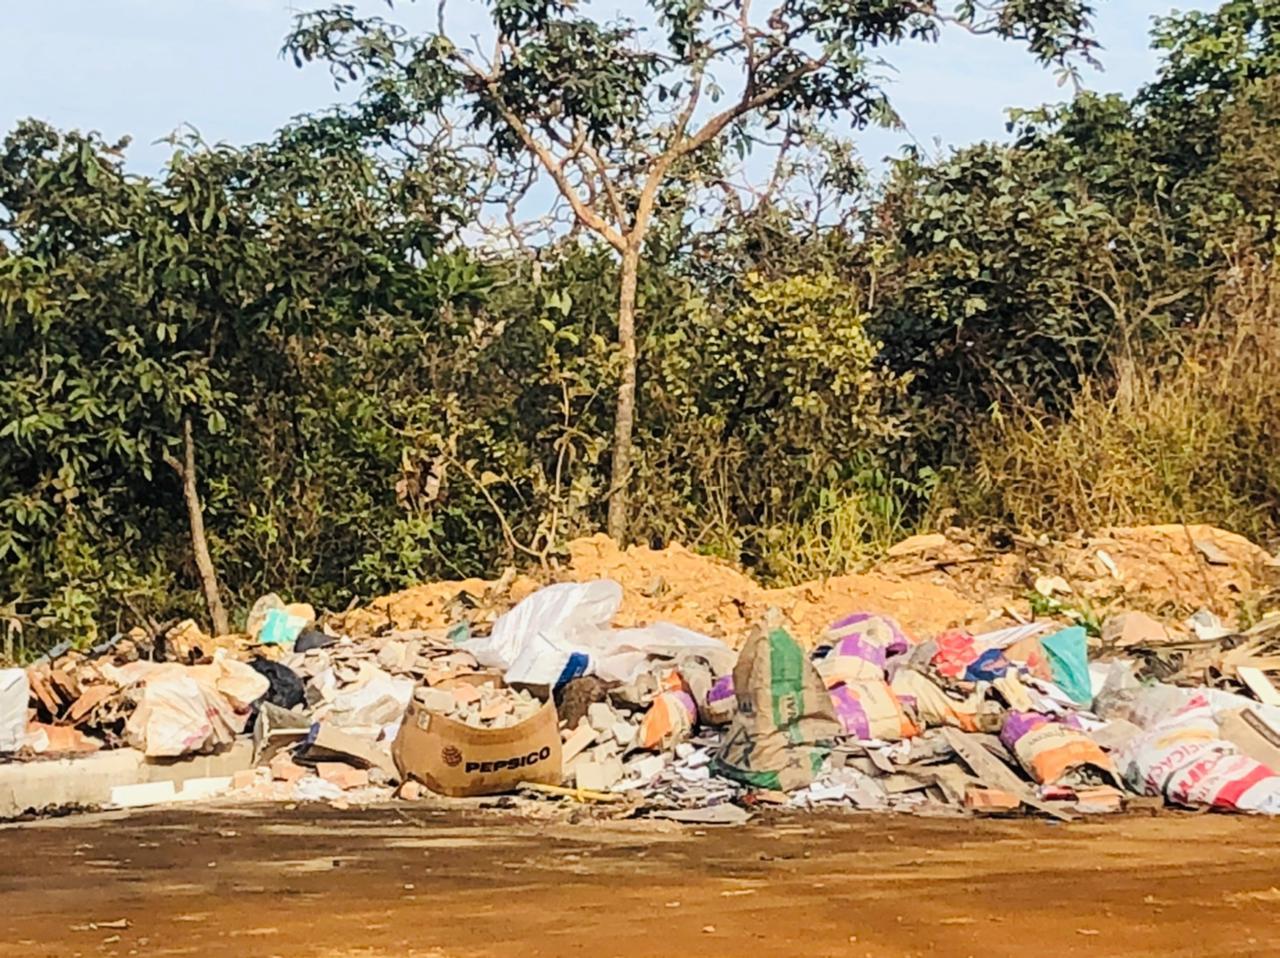 Divisa entre área urbana e rural de Lagoa Santa vira bota fora irregular